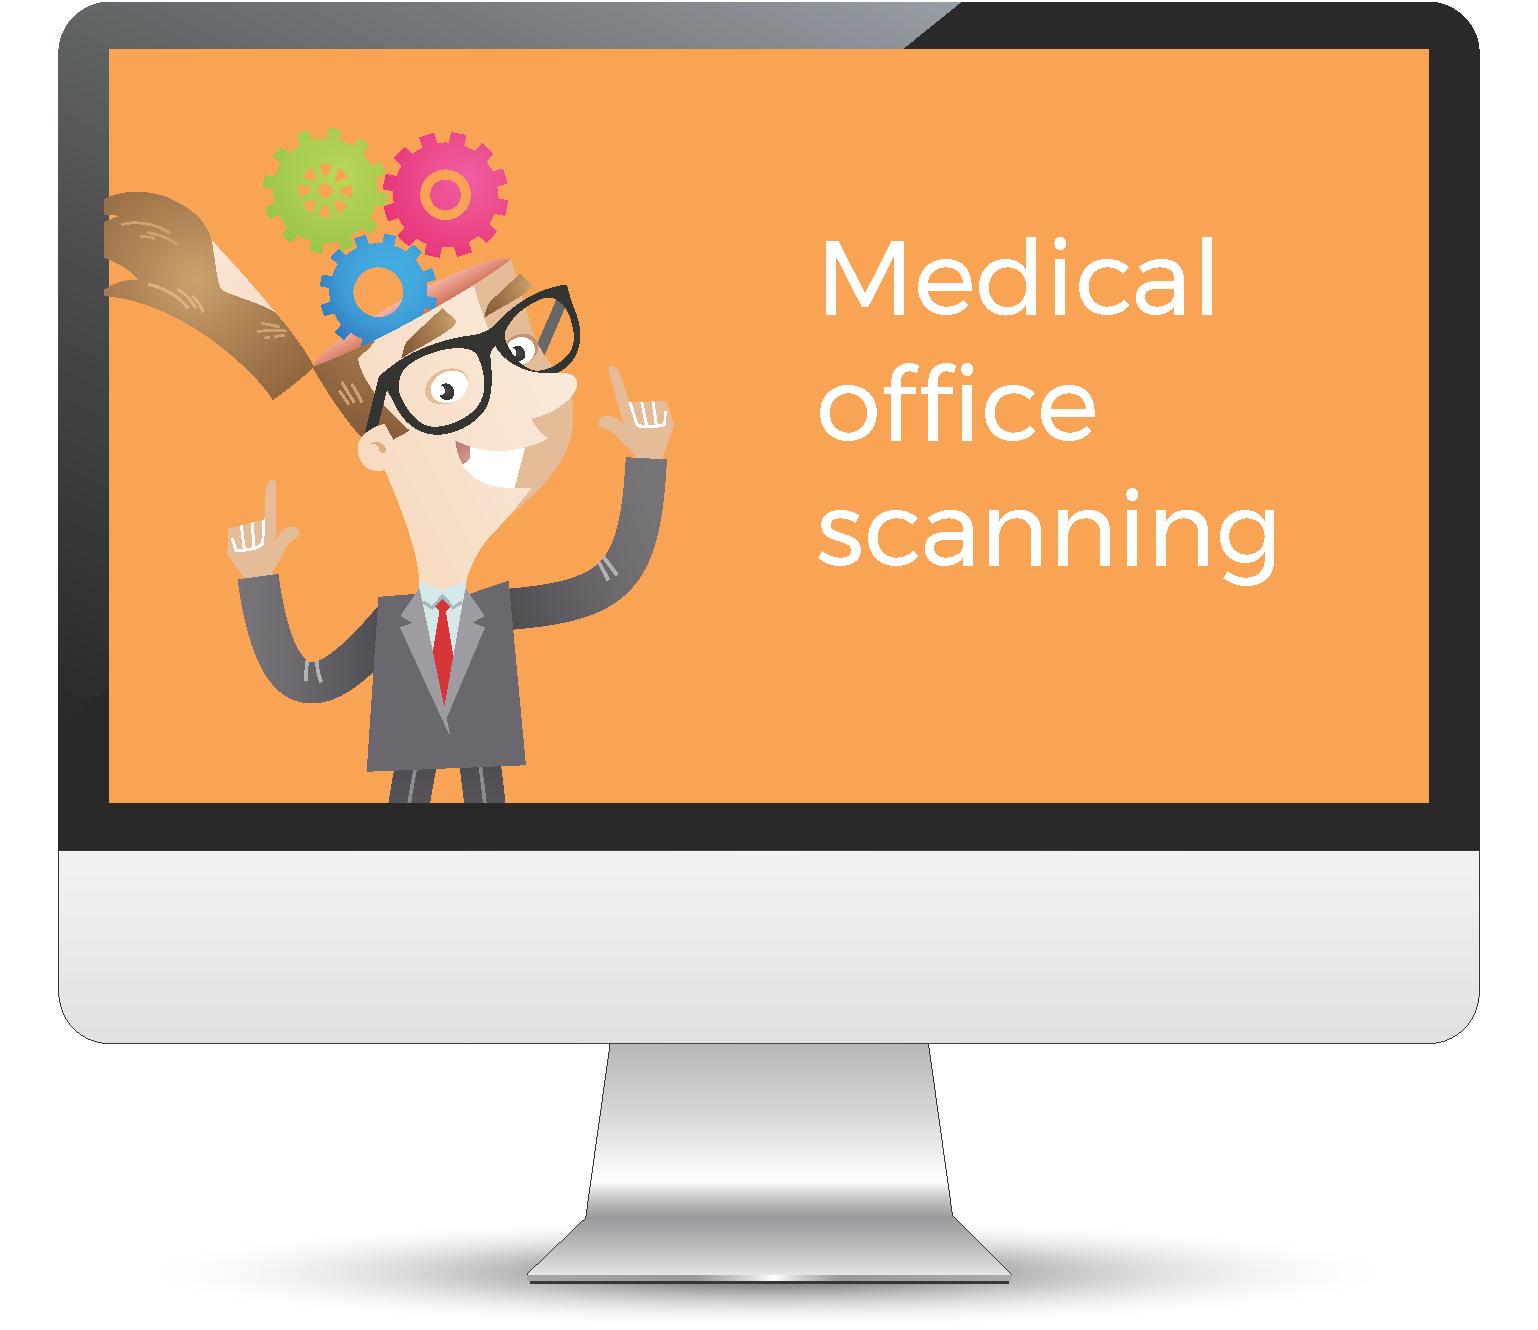 Scanning medical files